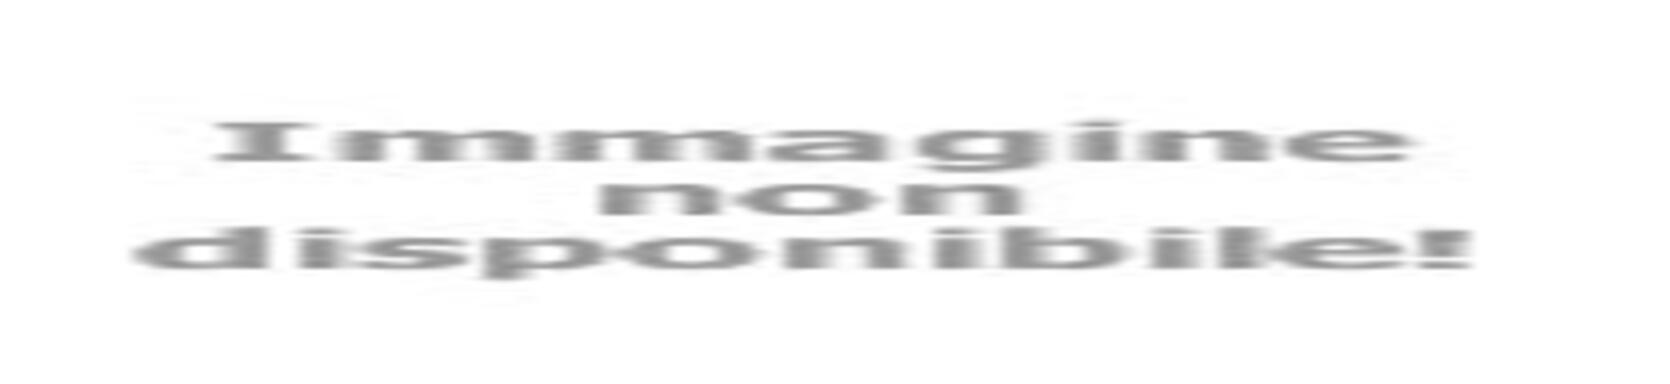 basketriminicrabs it 6-2727-video-eybl-u20-i-tappa-intervista-simone-carnaghi 003